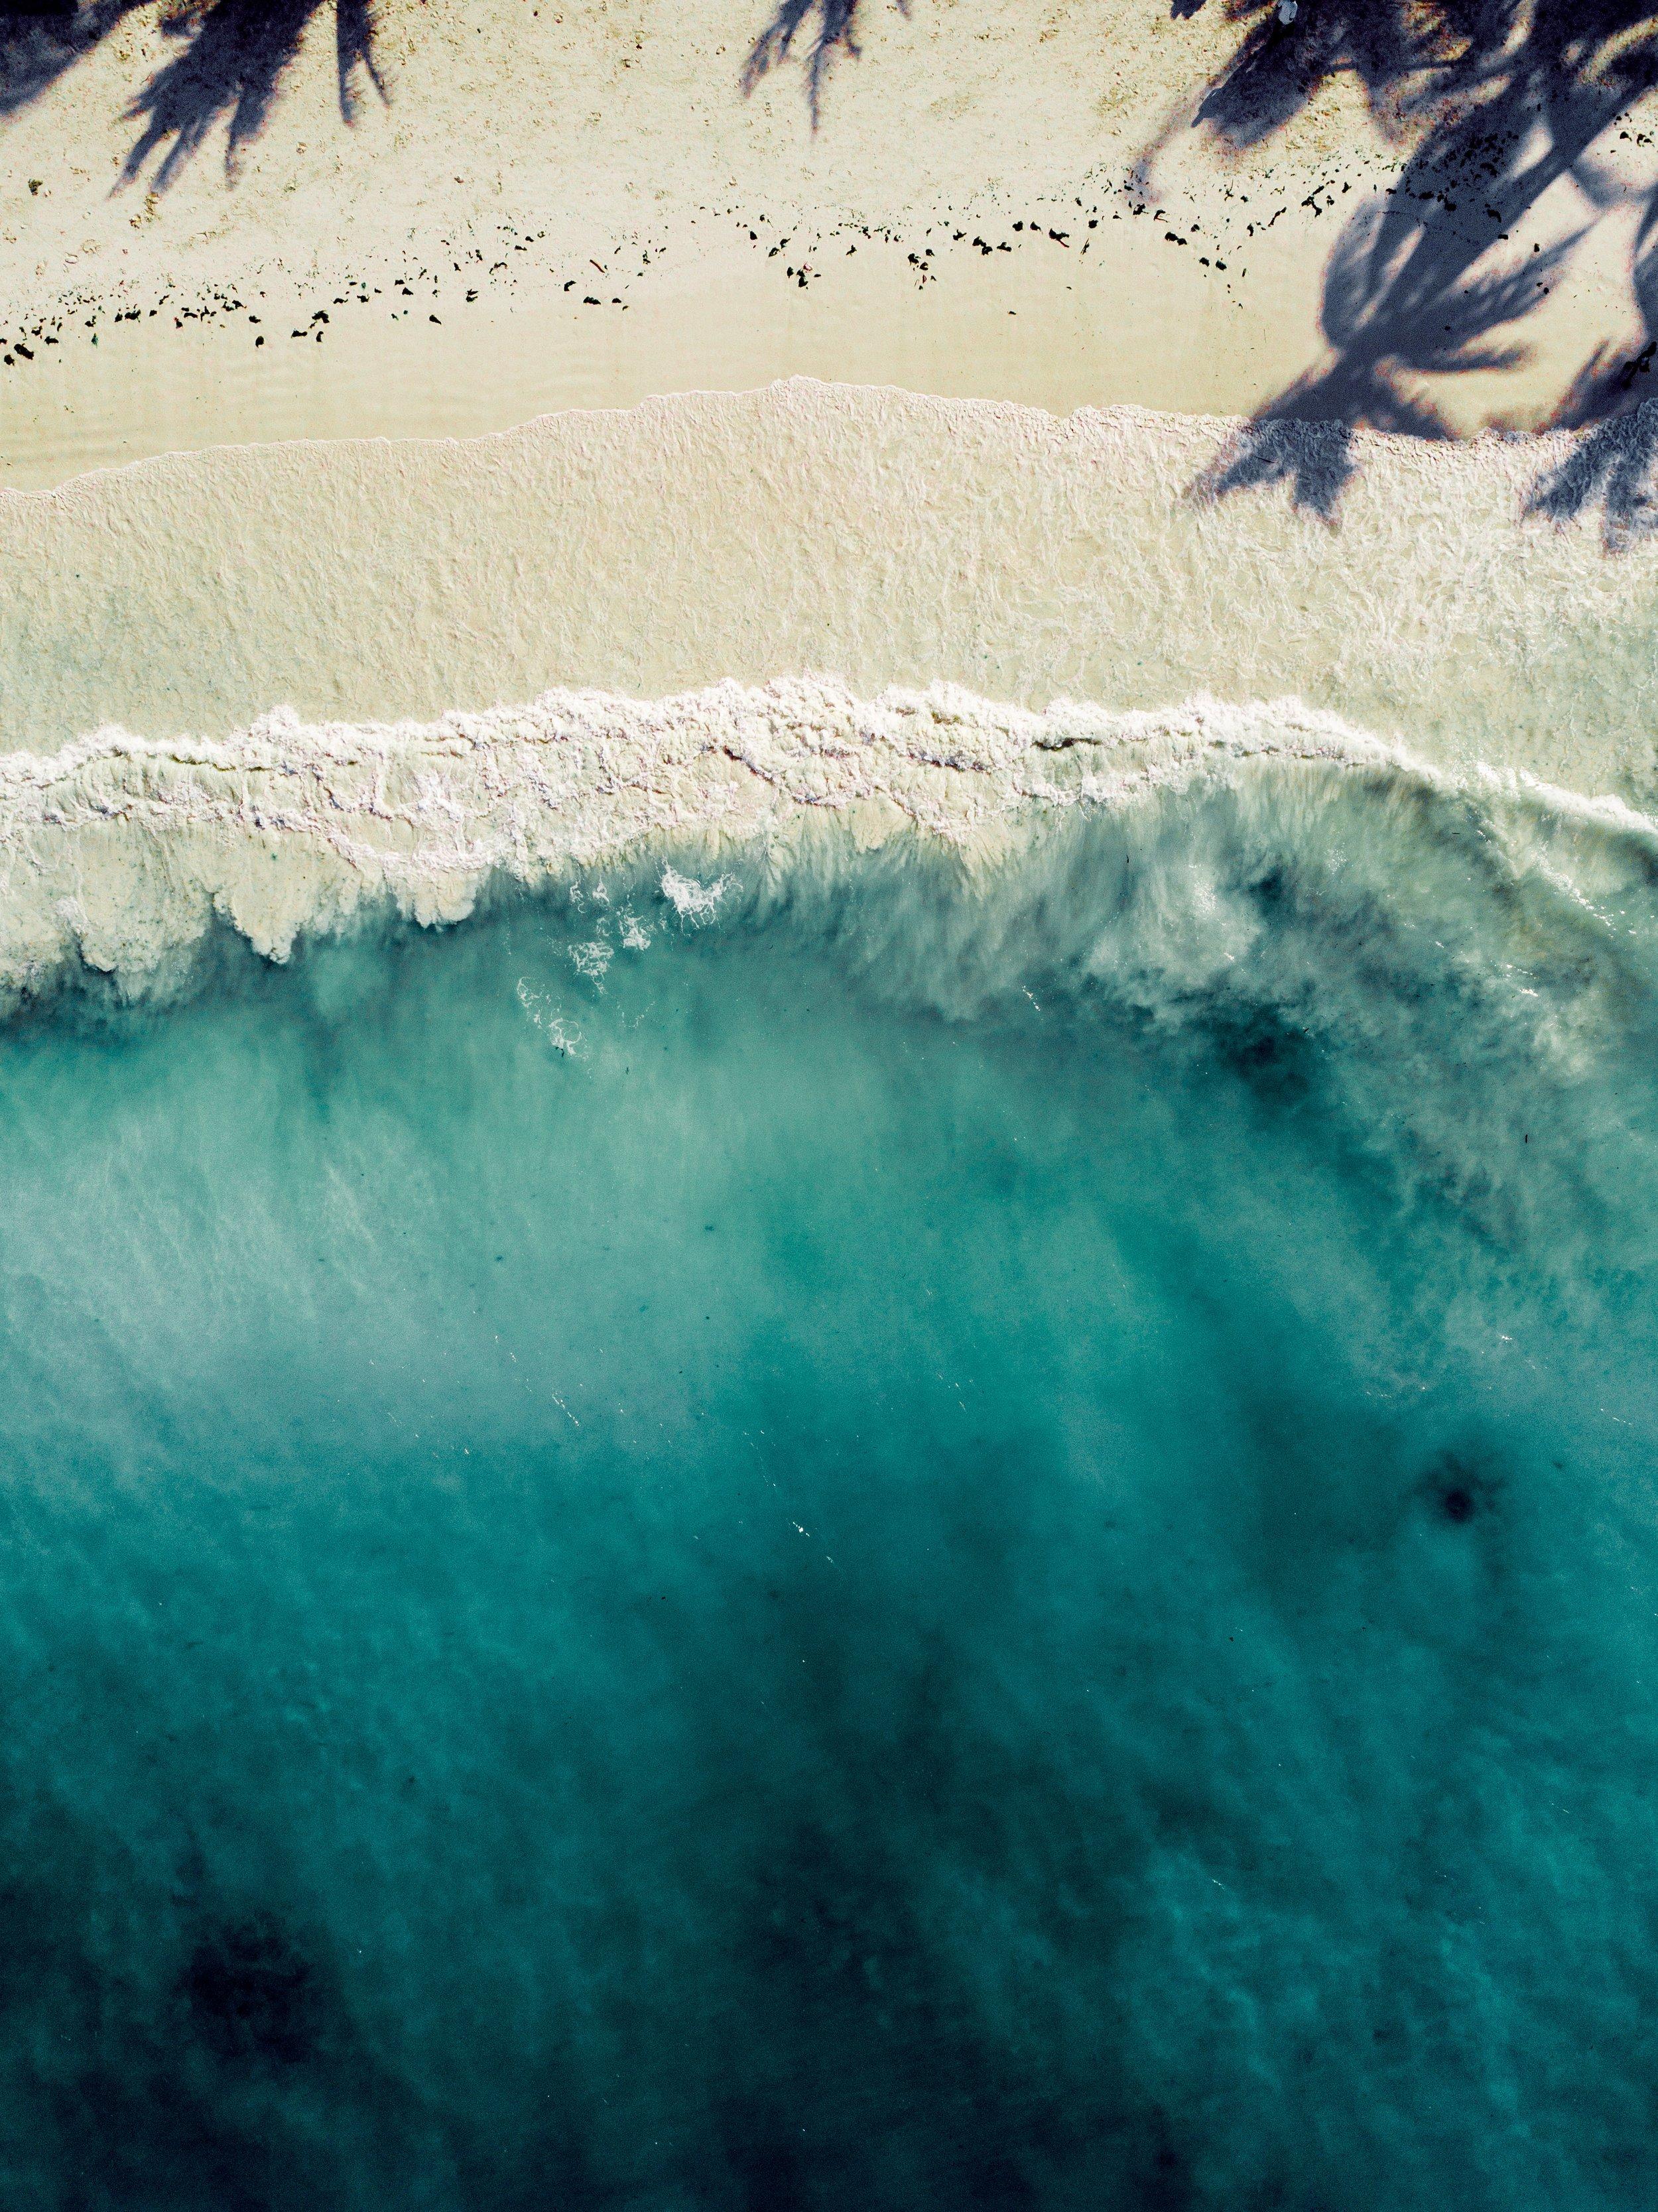 Zanzibar-1297925-unsplash.jpg